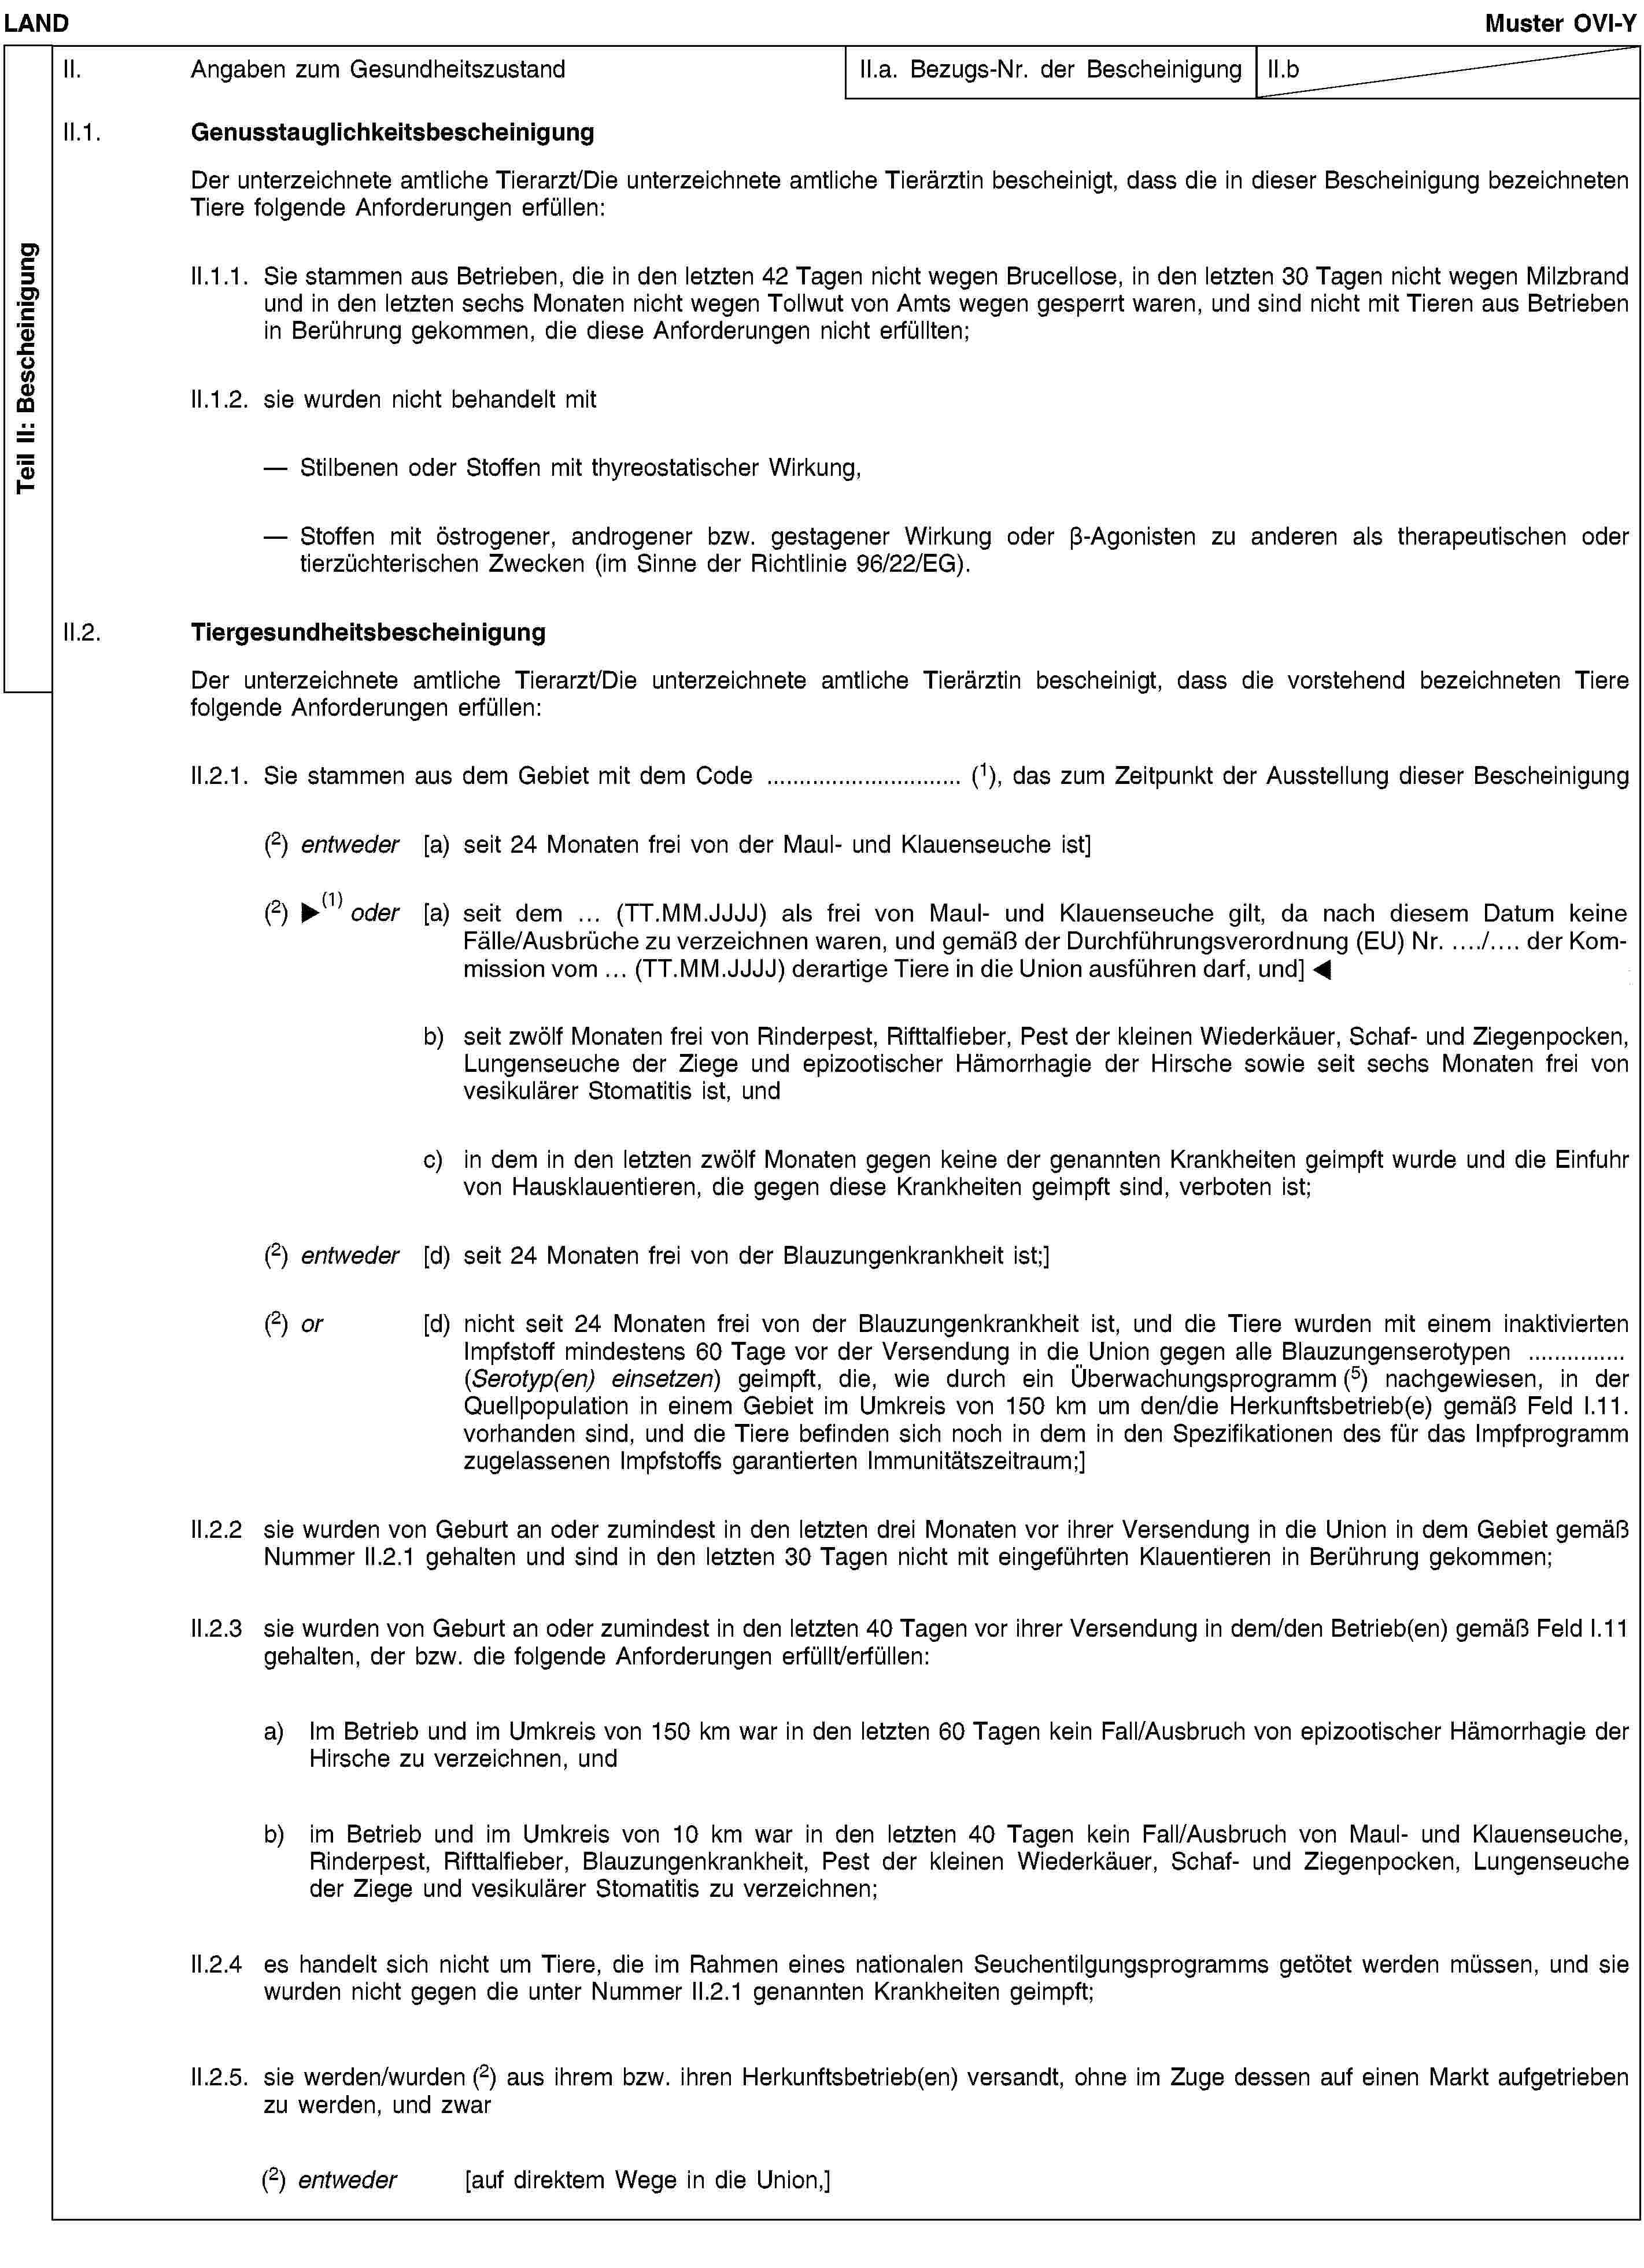 EUR-Lex - 02010R0206-20141204 - EN - EUR-Lex